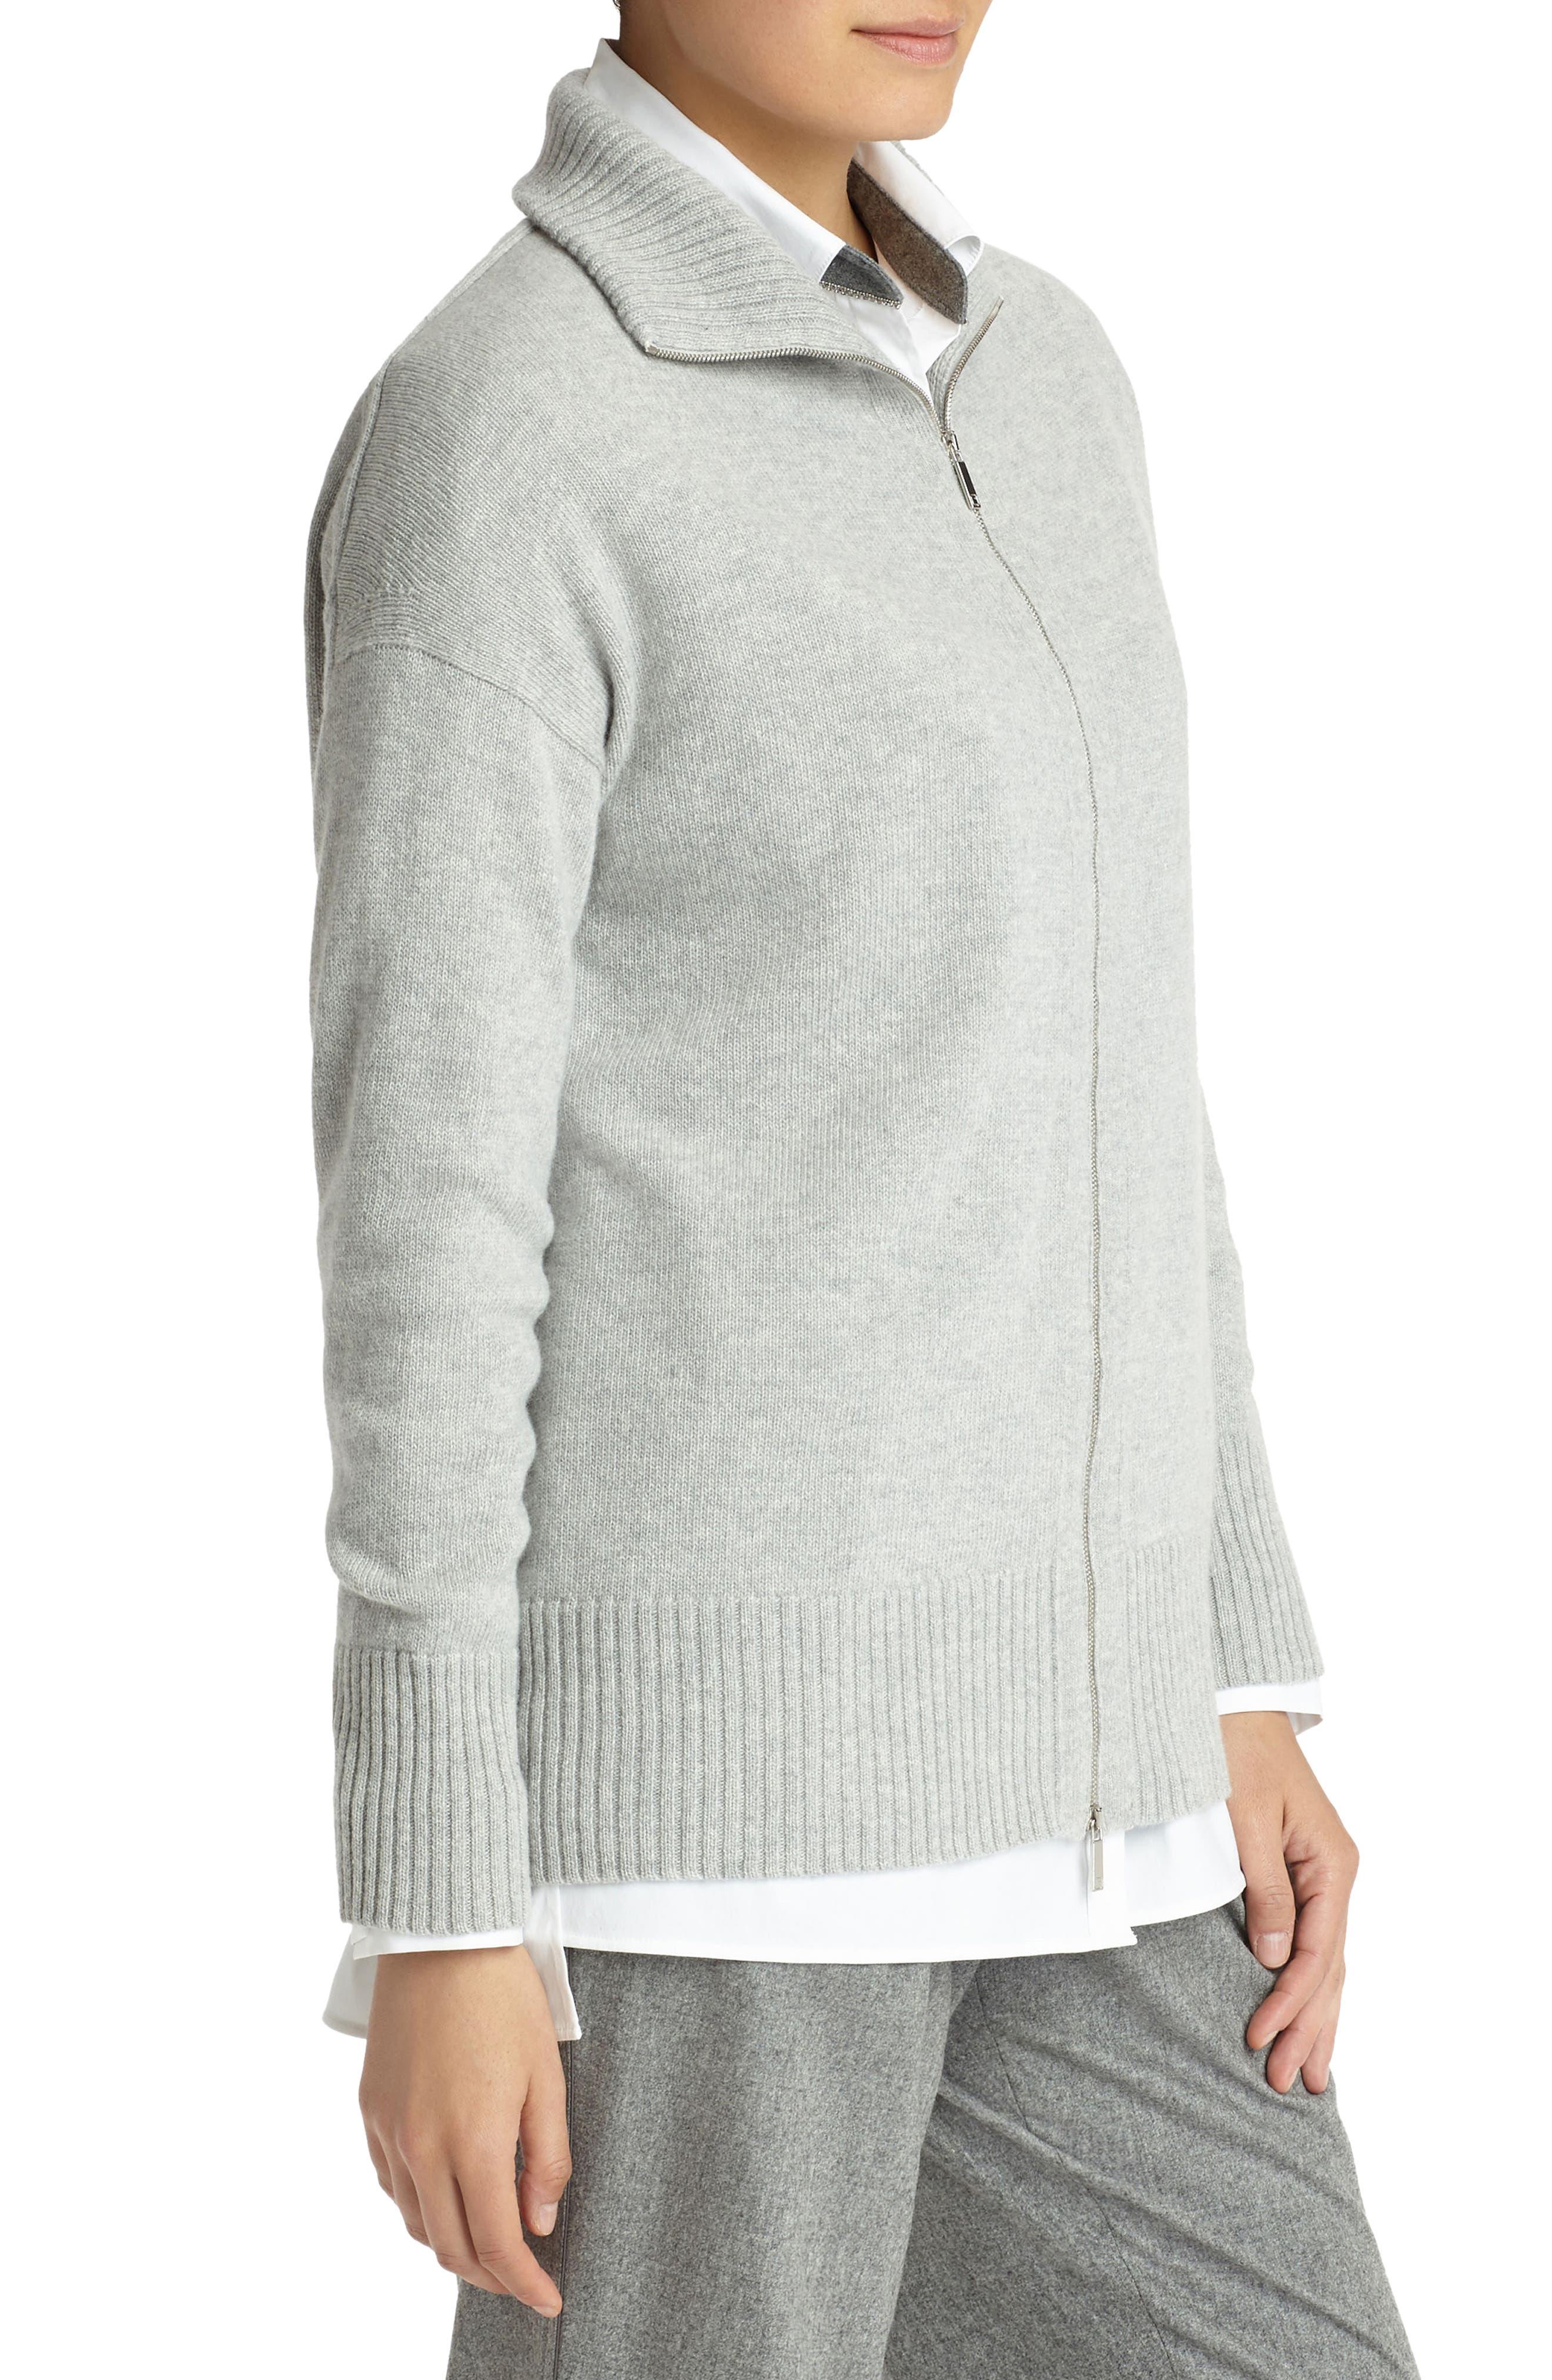 Alternate Image 3  - Lafayette 148 New York Luxe Merino Wool & Cashmere Sweater Jacket